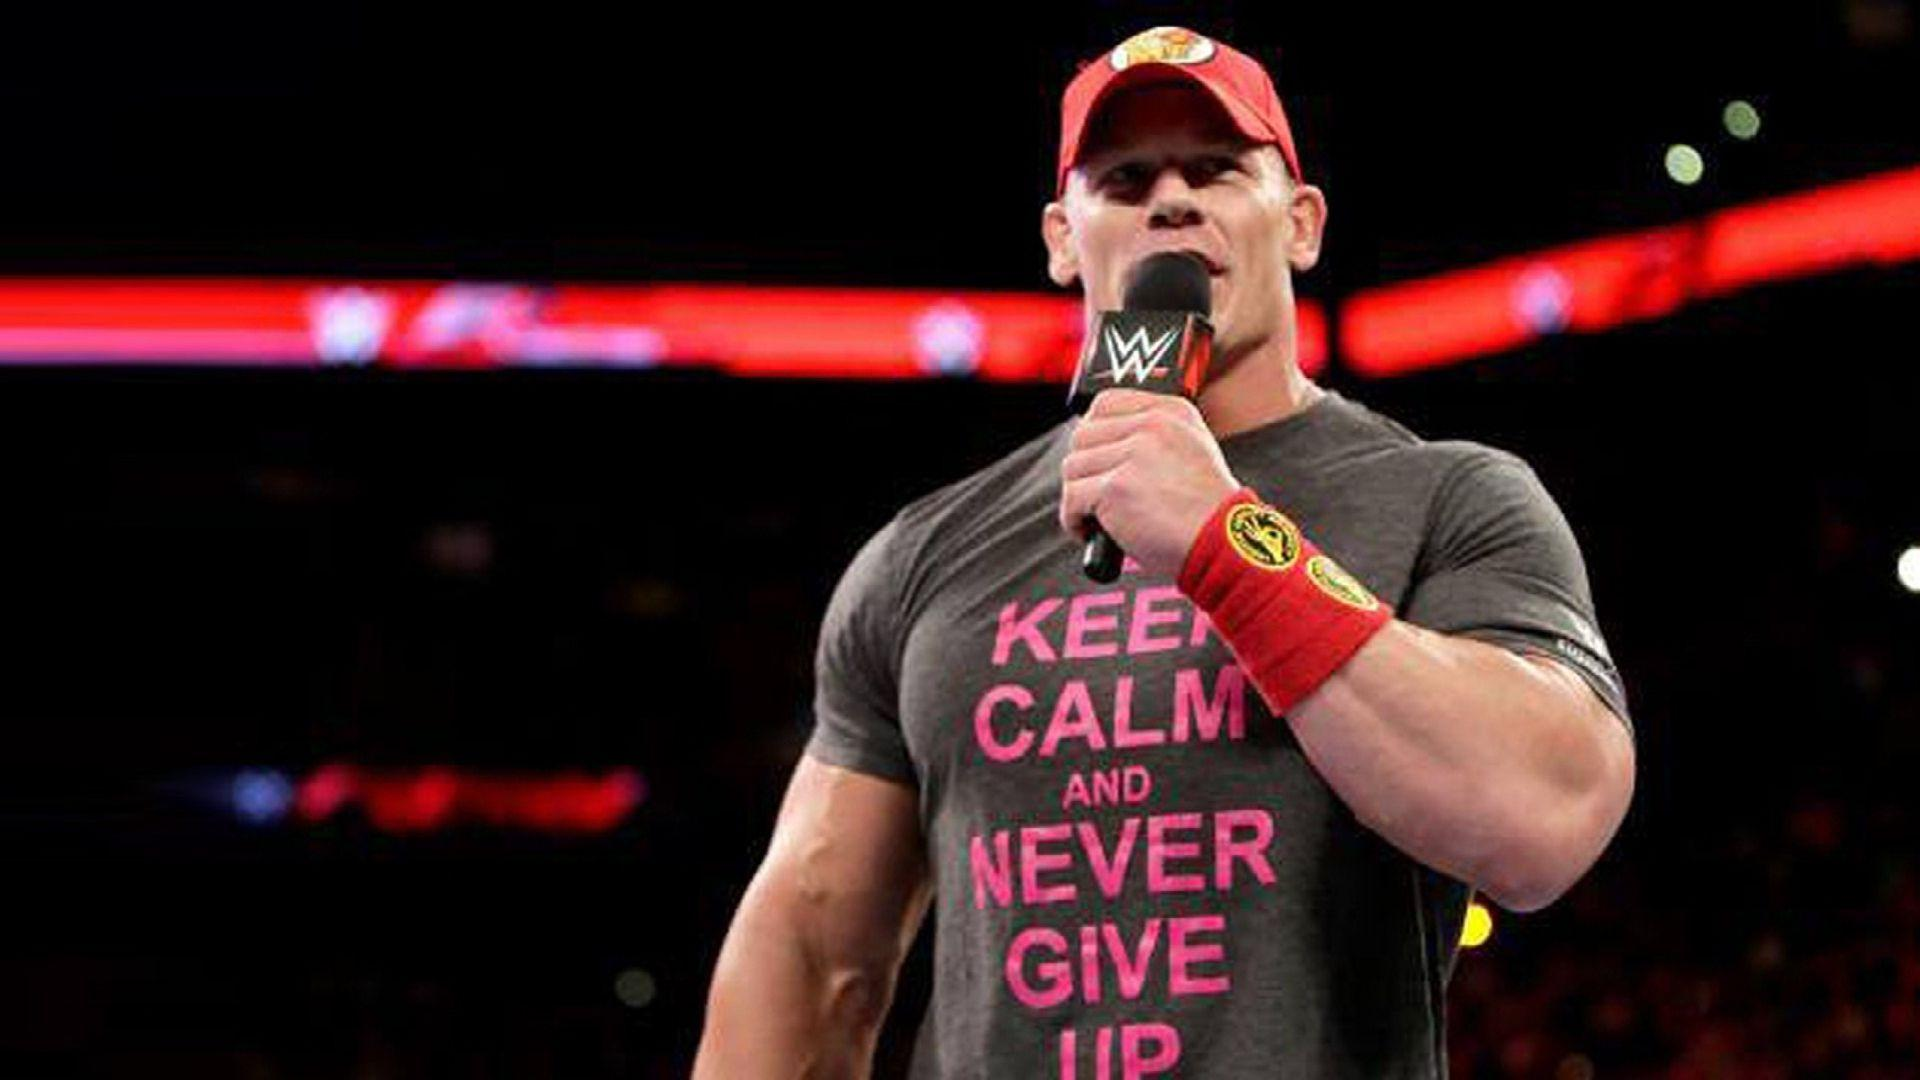 John Cena Wallpapers Hd Wallpaper Cave